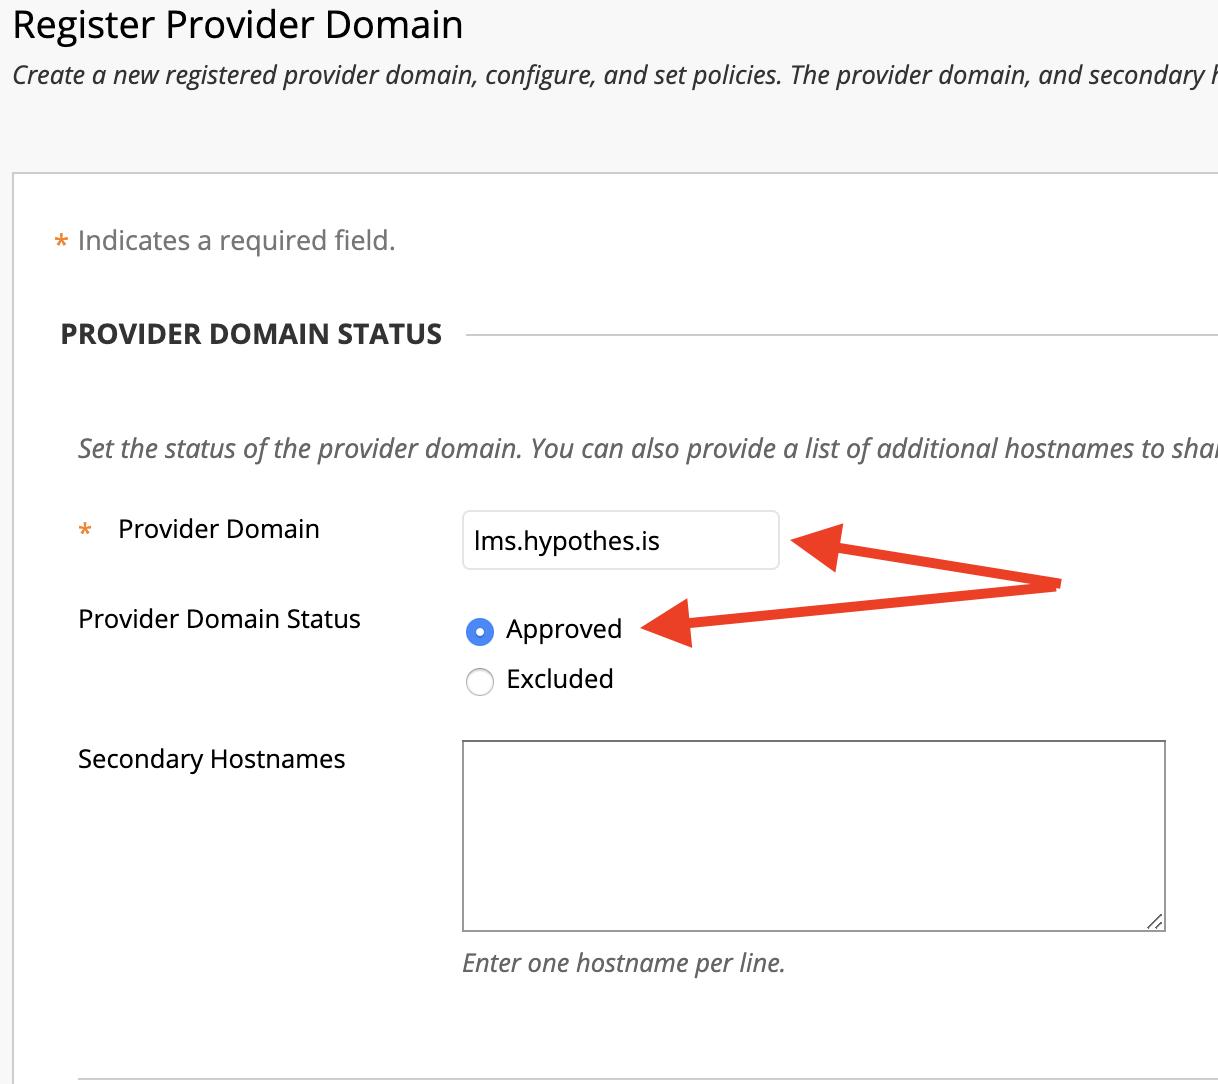 Register Provider Domain configuration